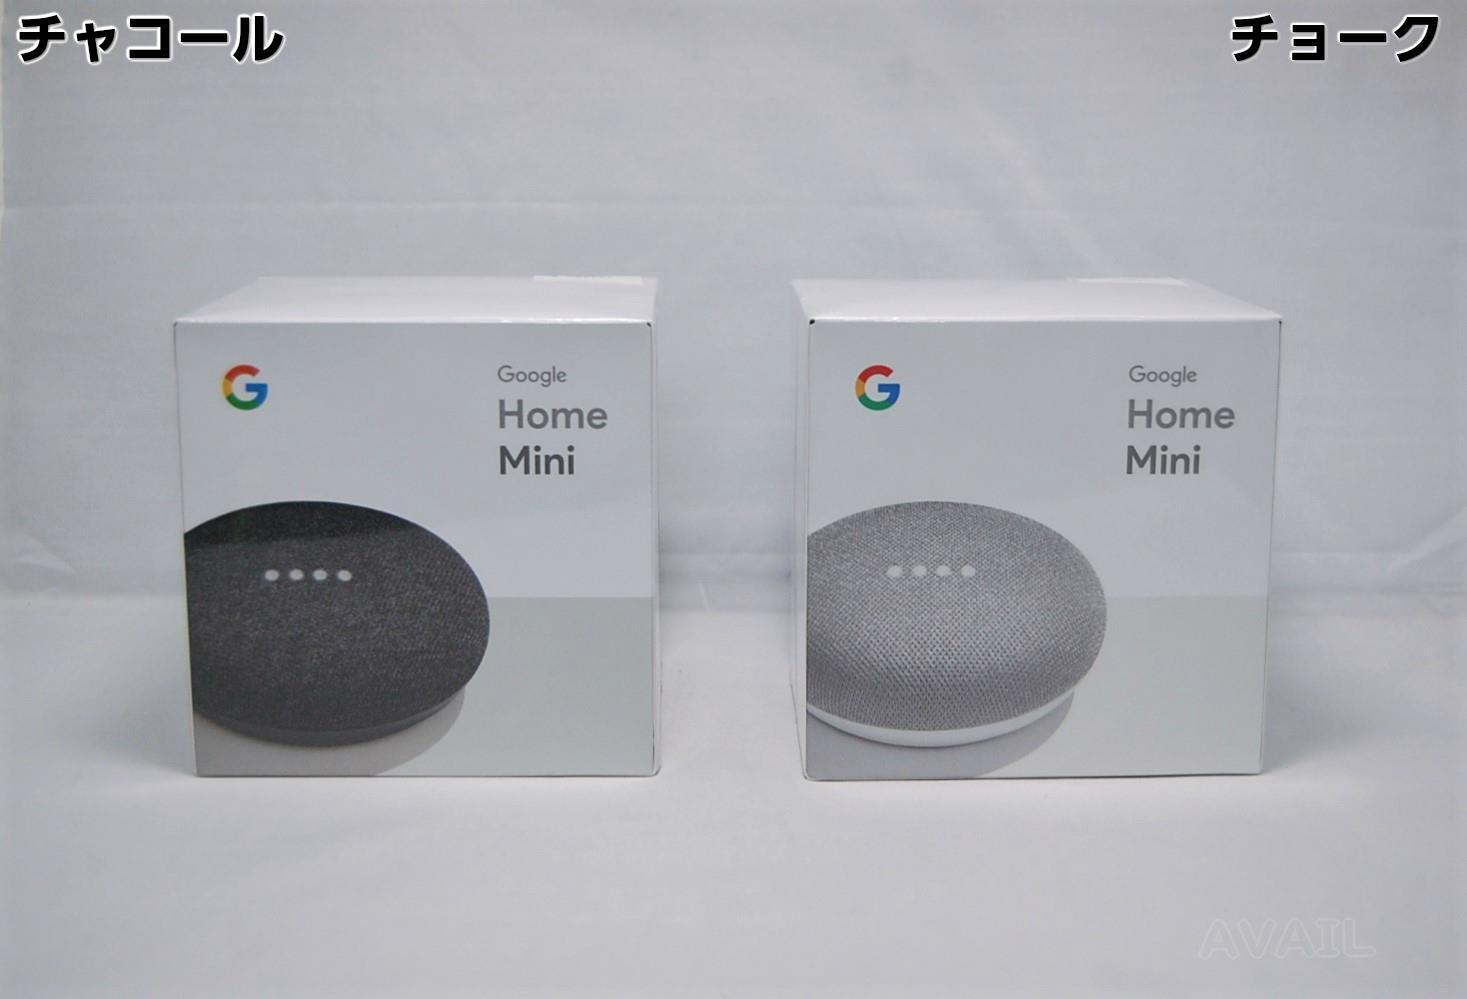 Google Home Mini グーグル ホームミニ (チョーク/チャコール) ワイヤレス スピーカー スマートスピーカー AIスピーカー 2.4GHz 5GHz Wi-Fi 音楽 動画 映像 google グーグルホーム ホーム ミニ